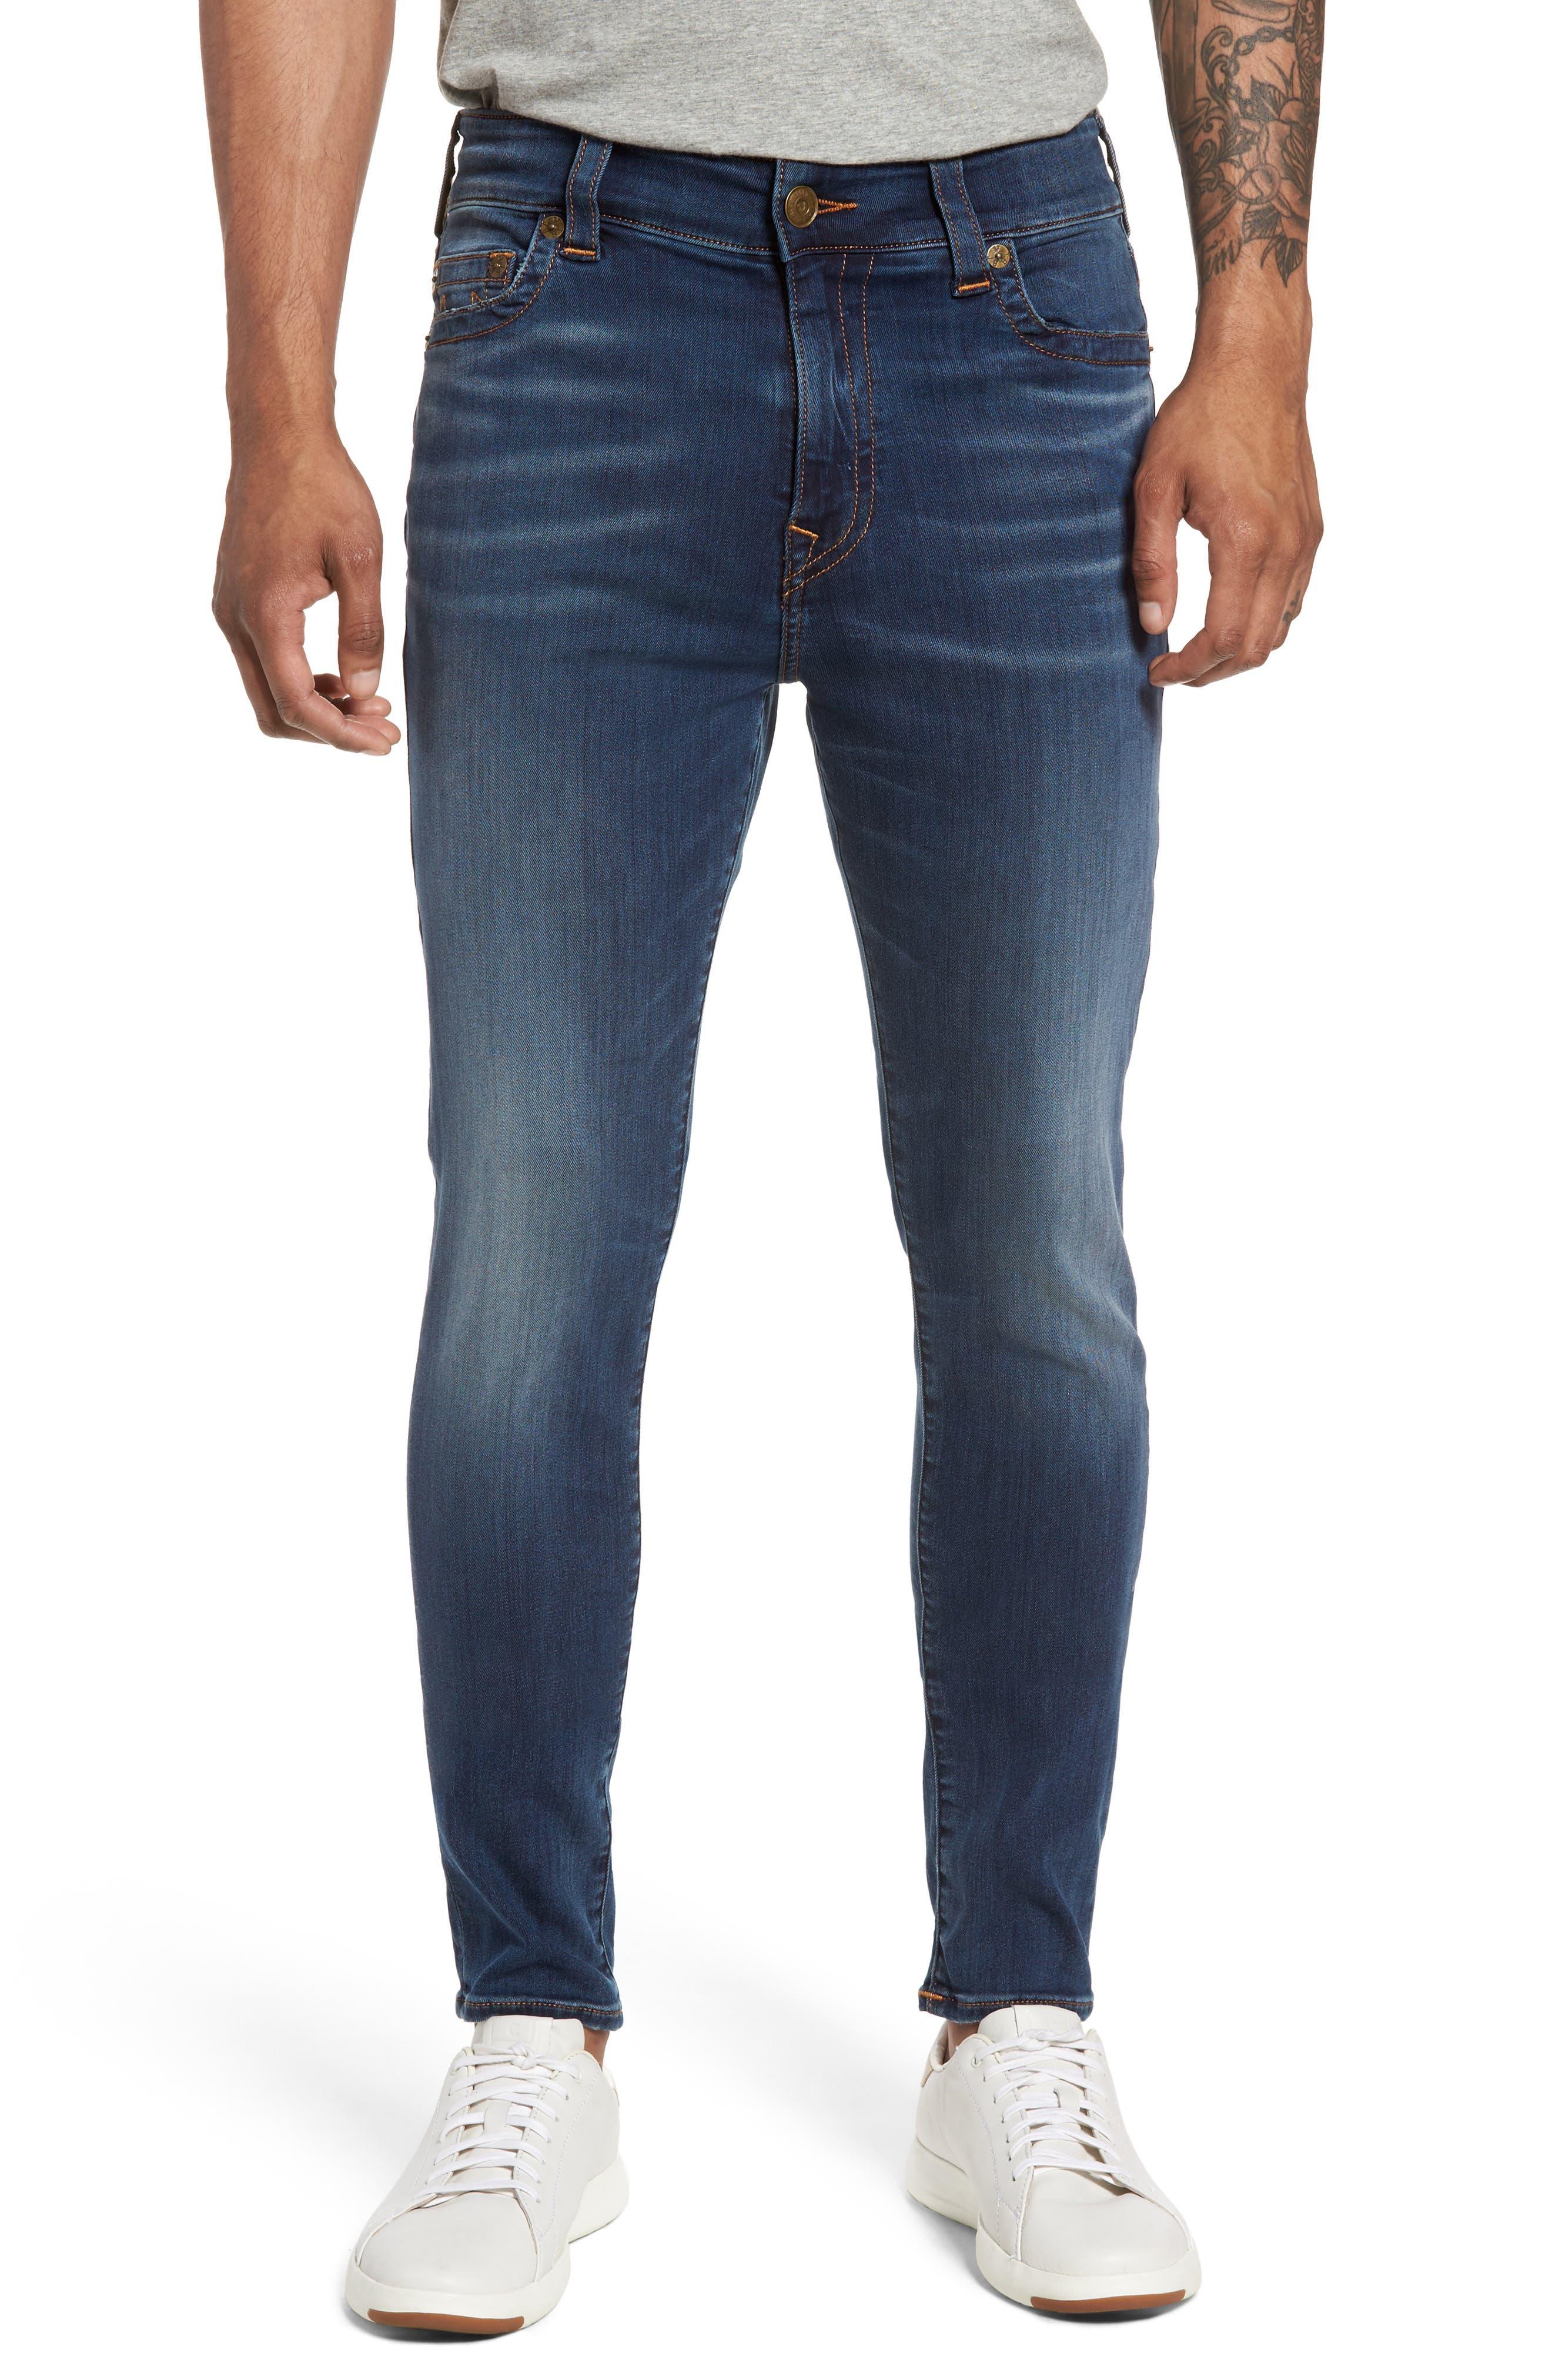 TRUE RELIGION BRAND JEANS Jack Skinny Fit Jeans